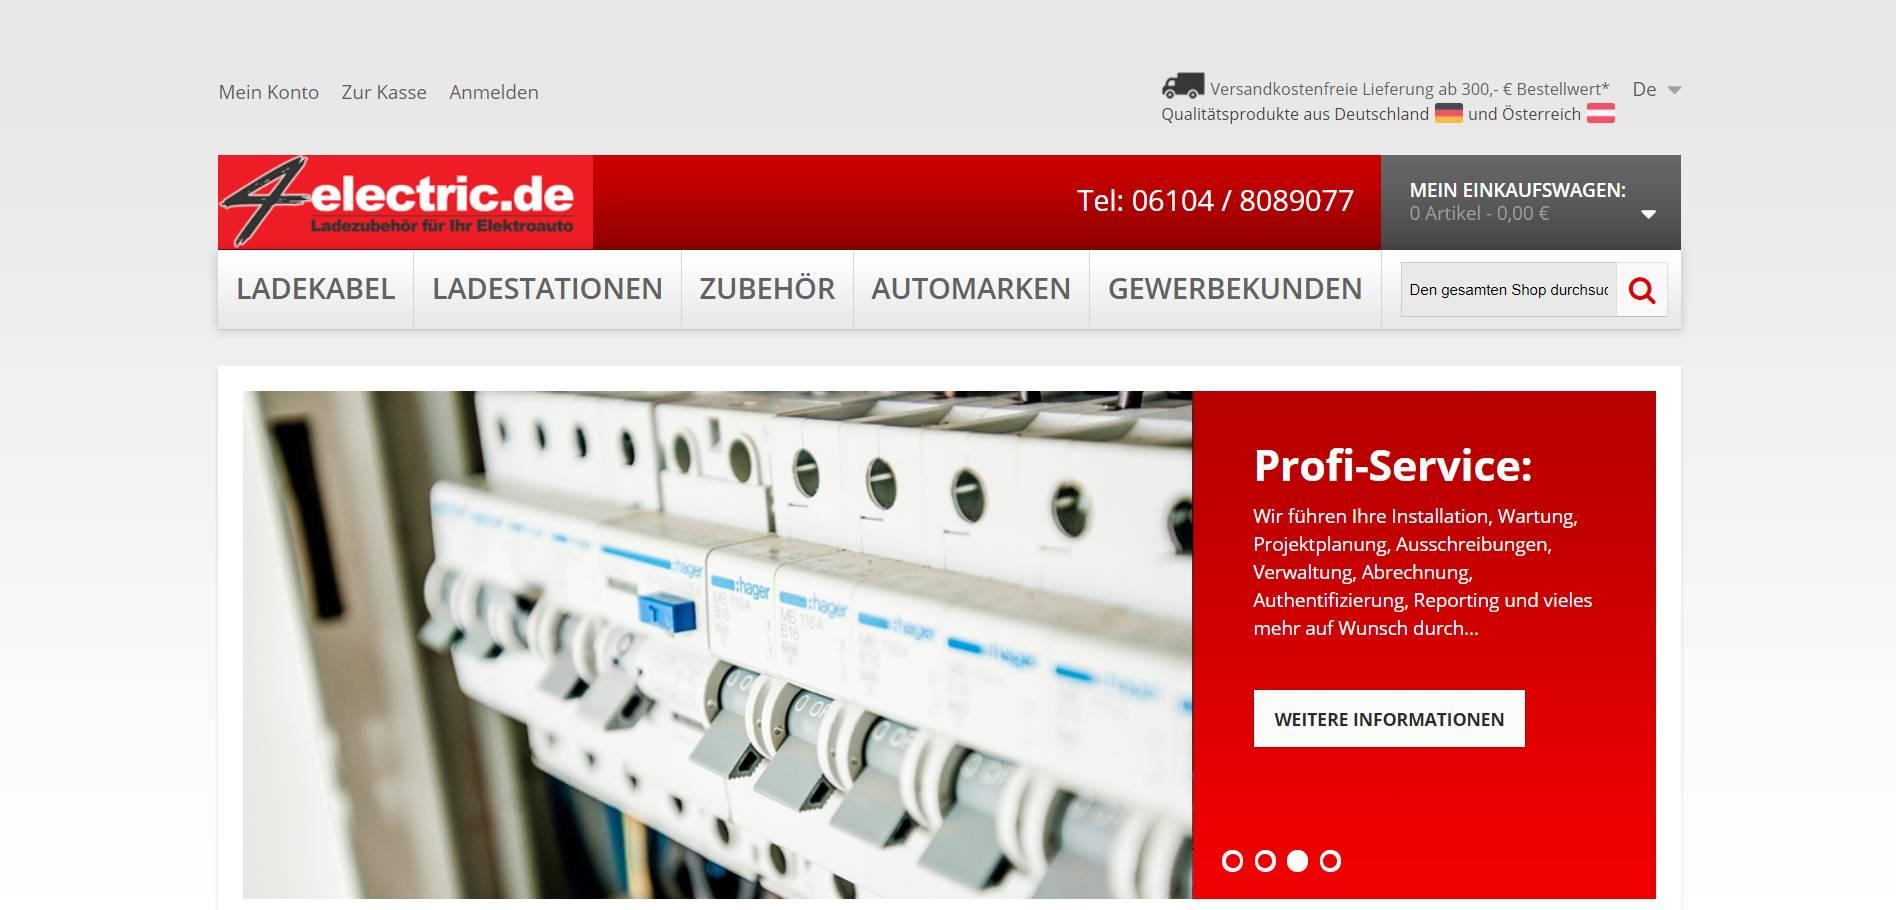 4electric.de